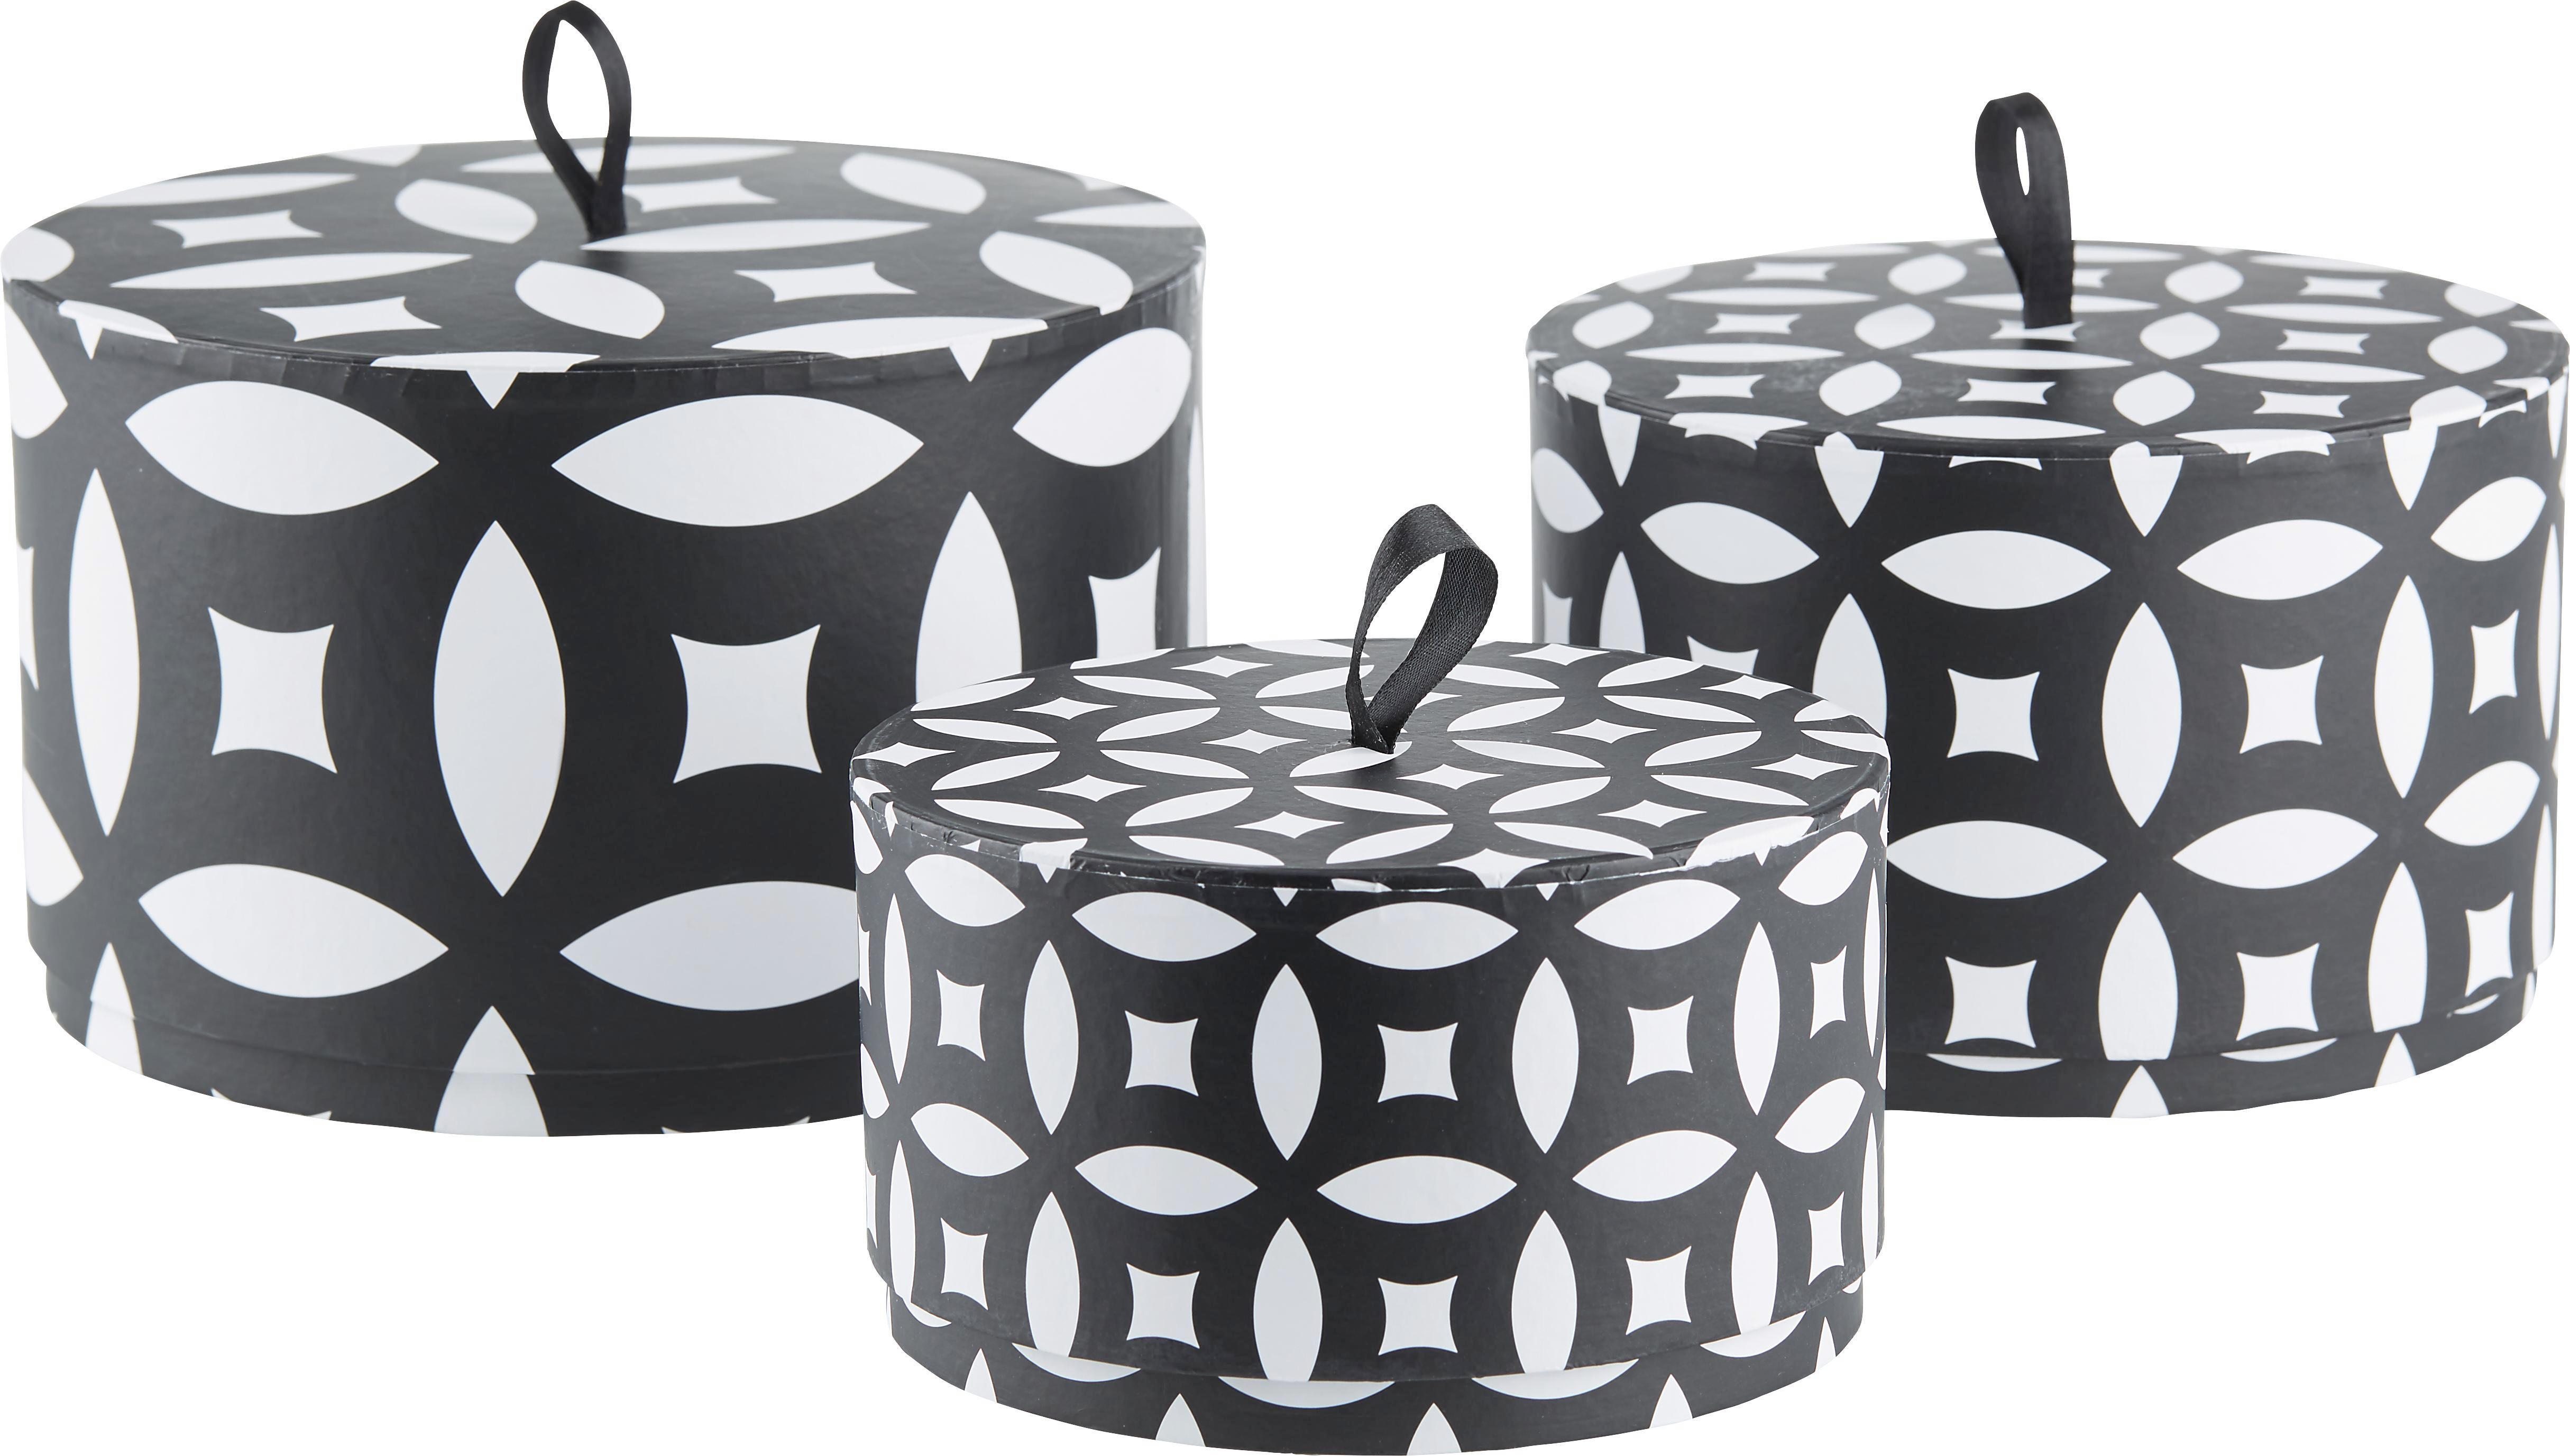 Ajándékdoboz Ethno - M - fekete/fehér, Lifestyle, karton (16,5/10cm) - MÖMAX modern living